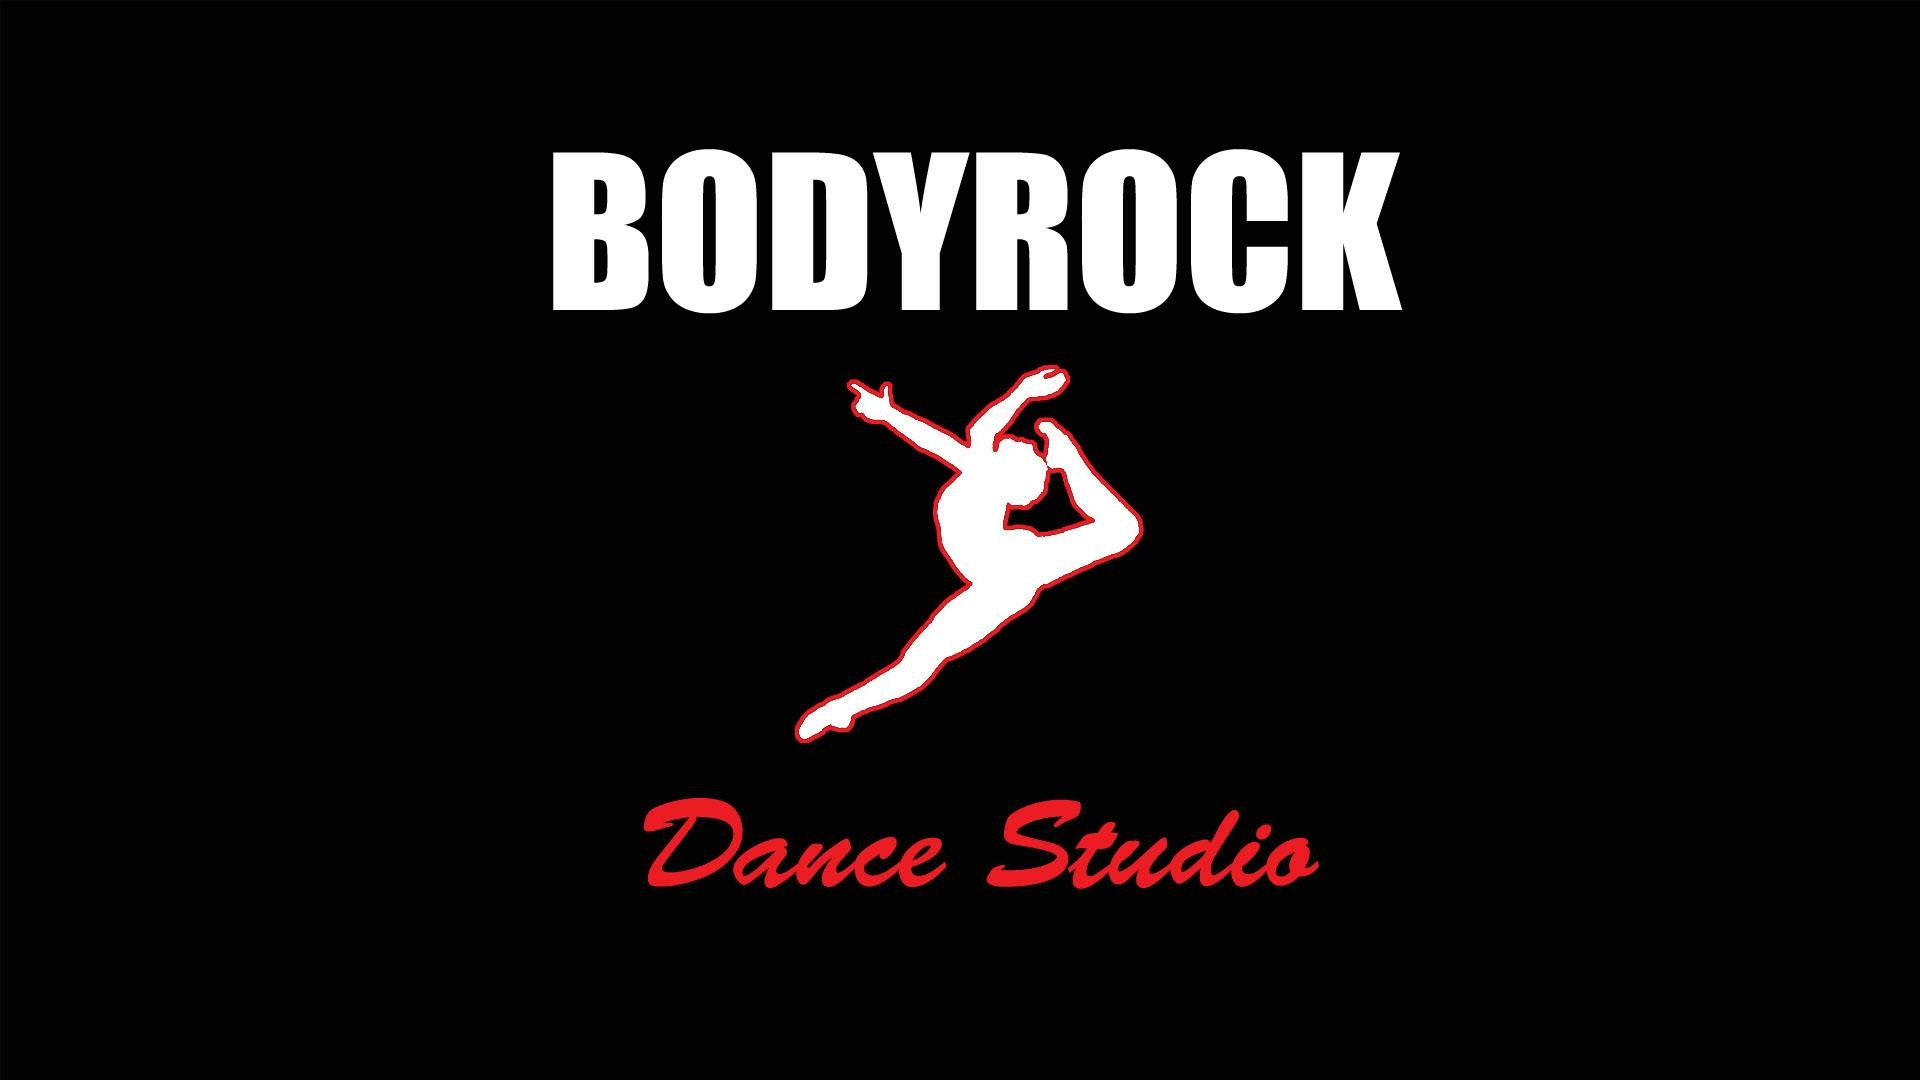 Bodyrock Dance Studio | Warners Bay, New South Wales 2282 | +61 439 434 294